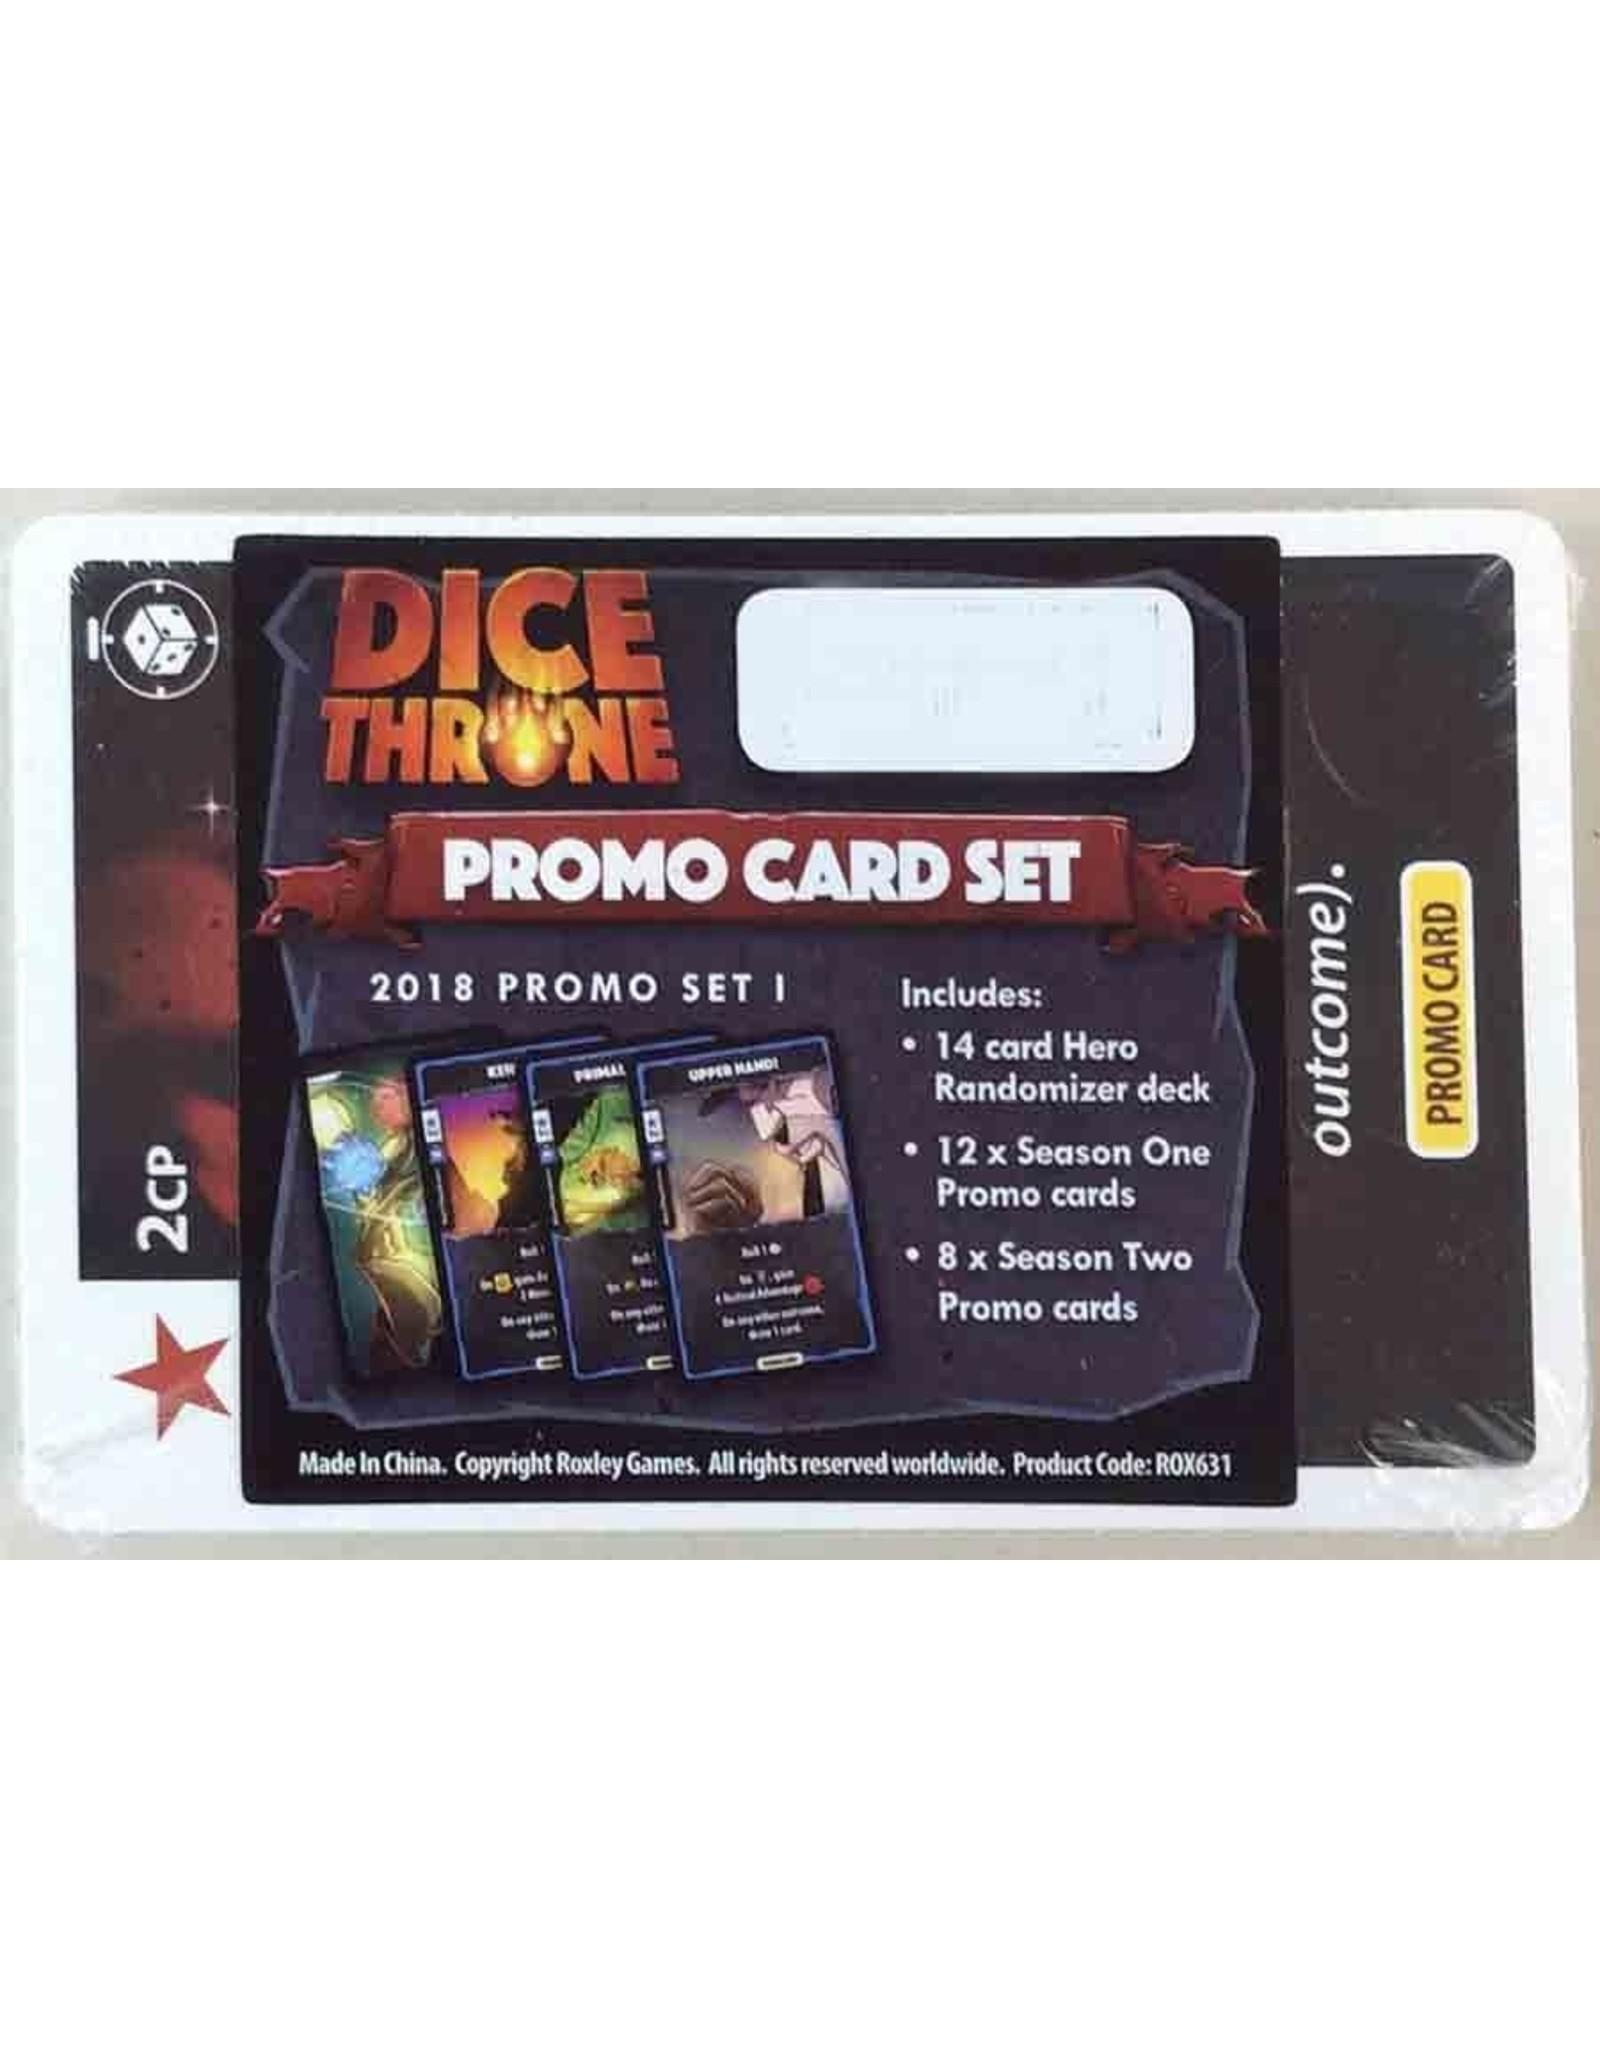 Dice Throne Season 1 Promo Pack 2018